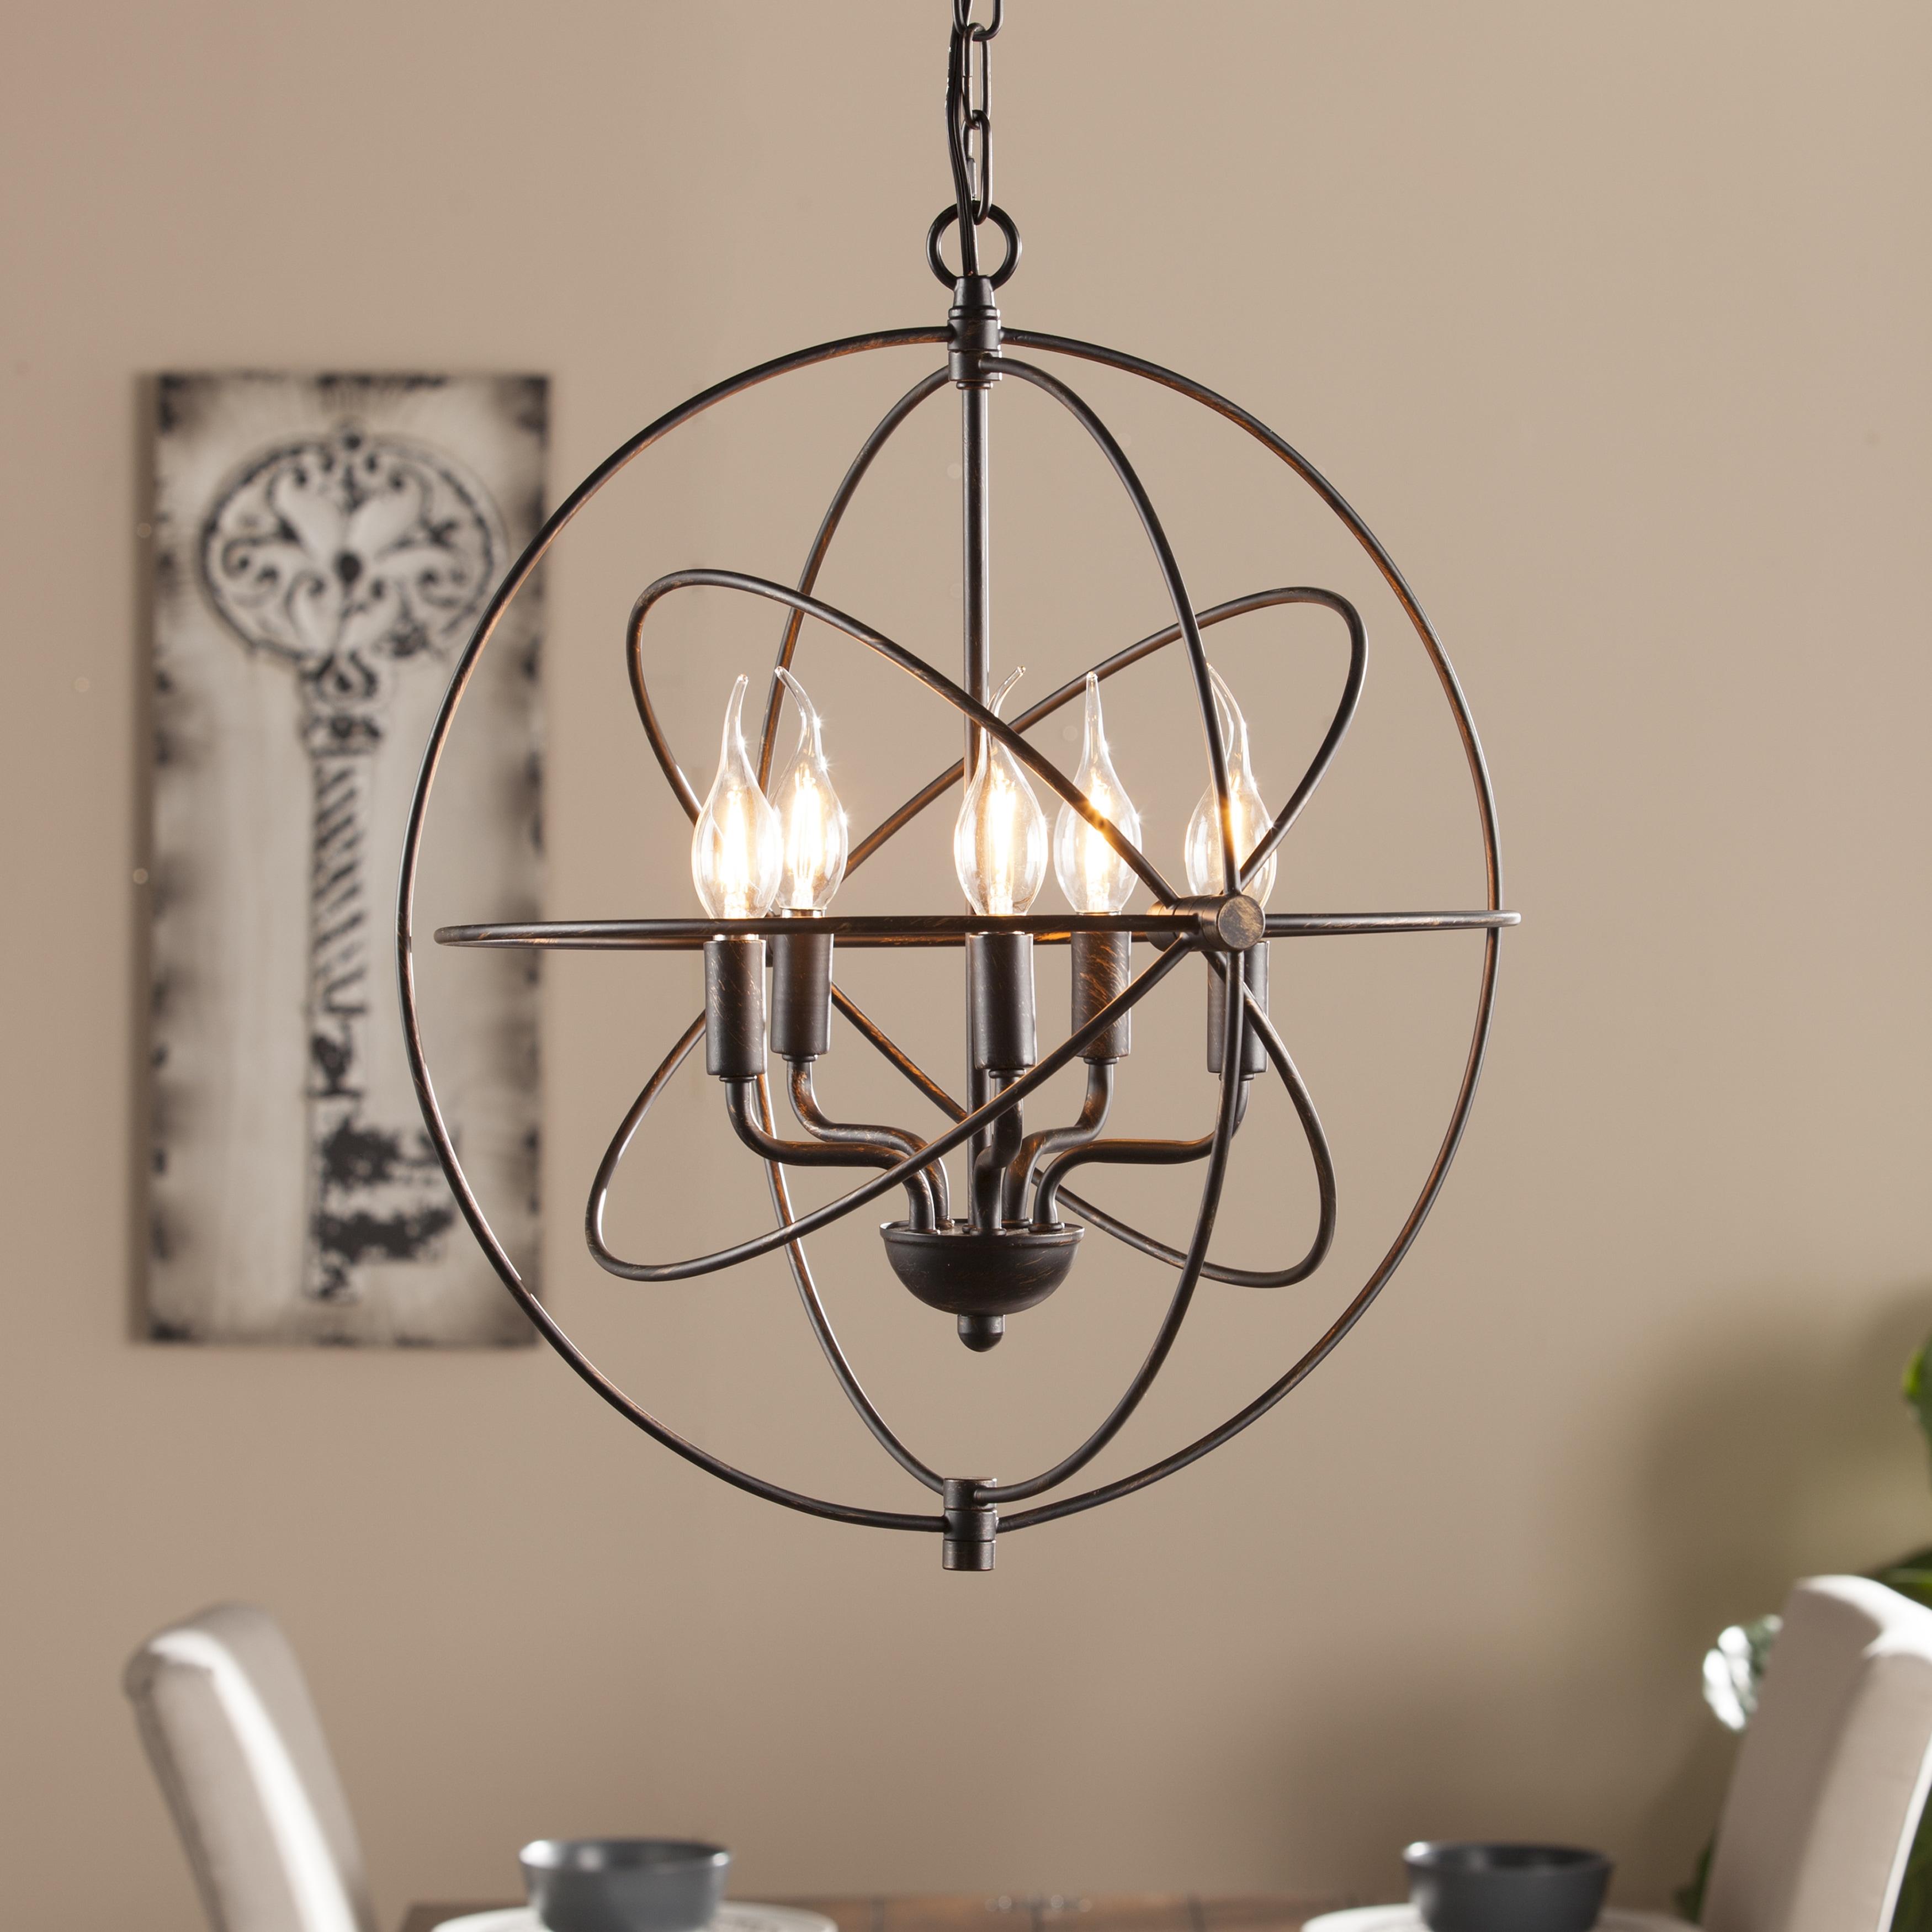 Harper Blvd Novus 5-Light Orb Pendant Lamp (OS9081TL), Br...